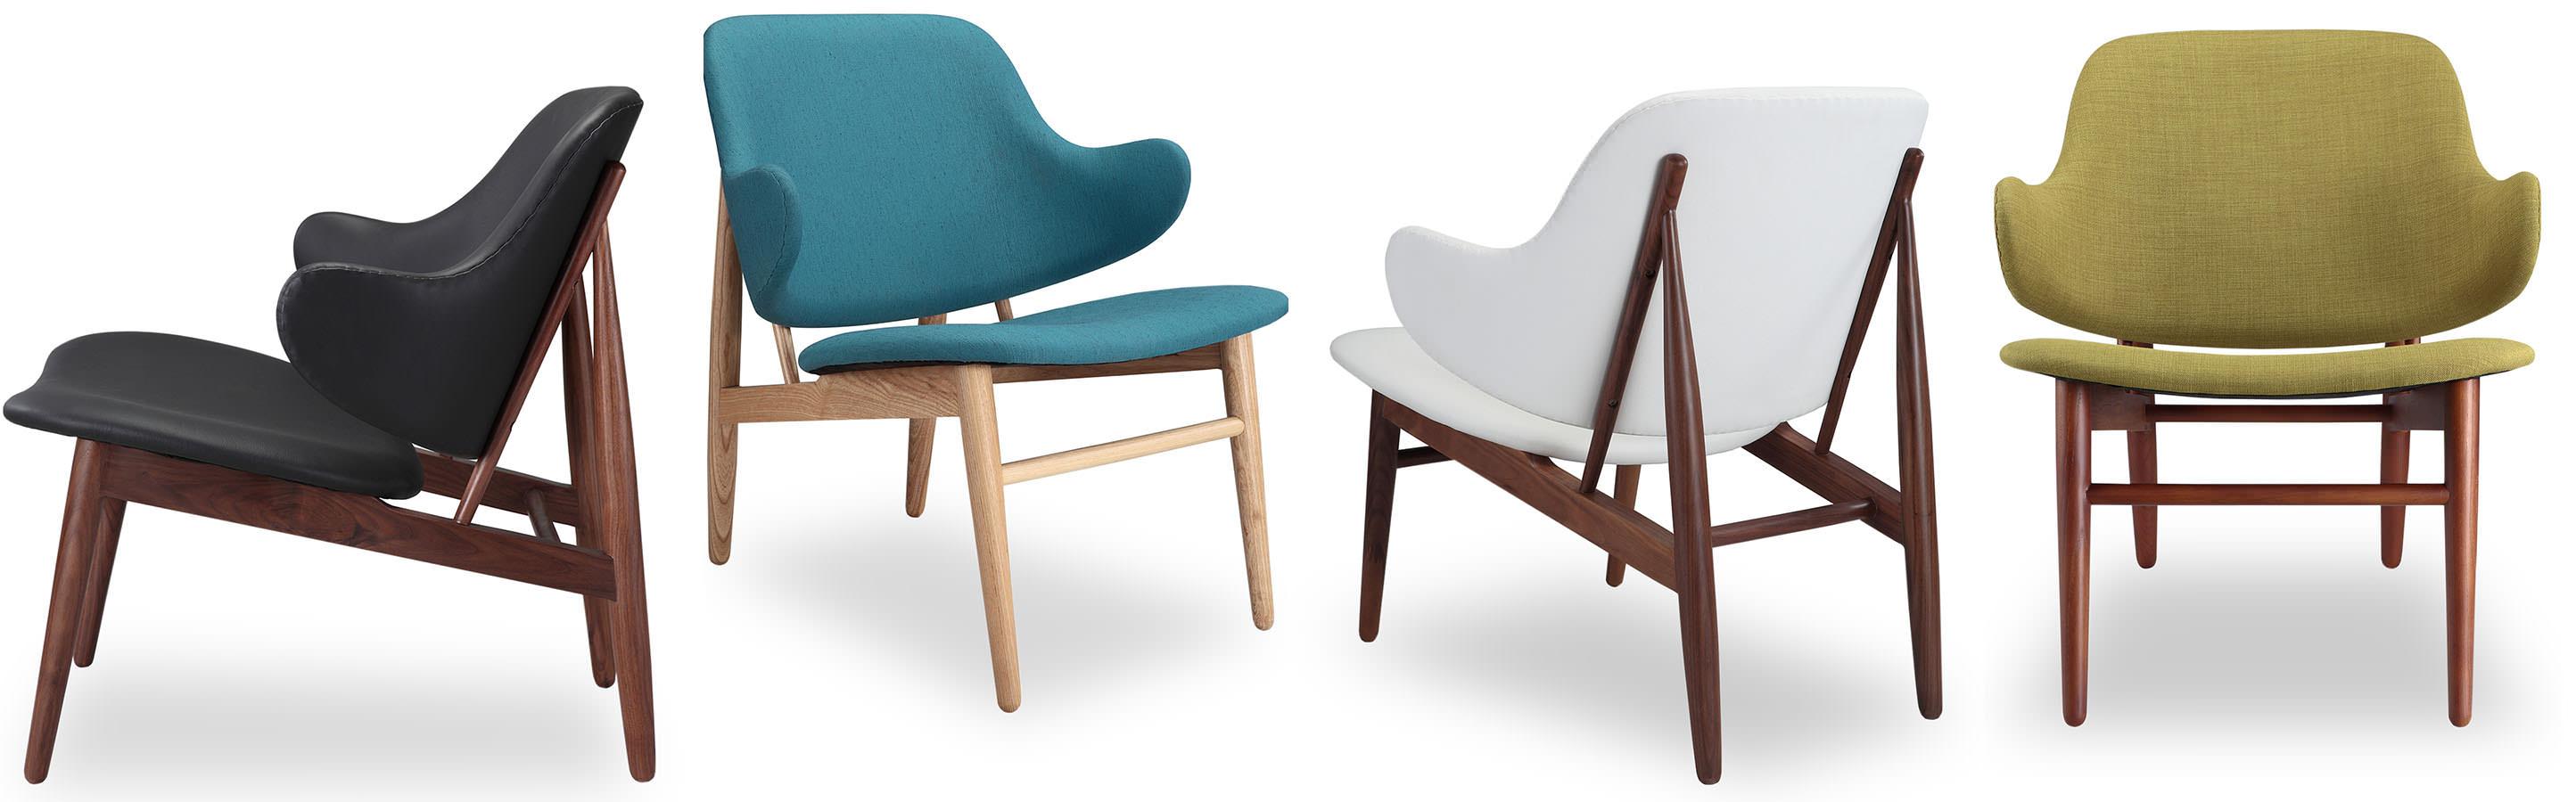 Tripod Shell Plywood Mid Century Modern Chair